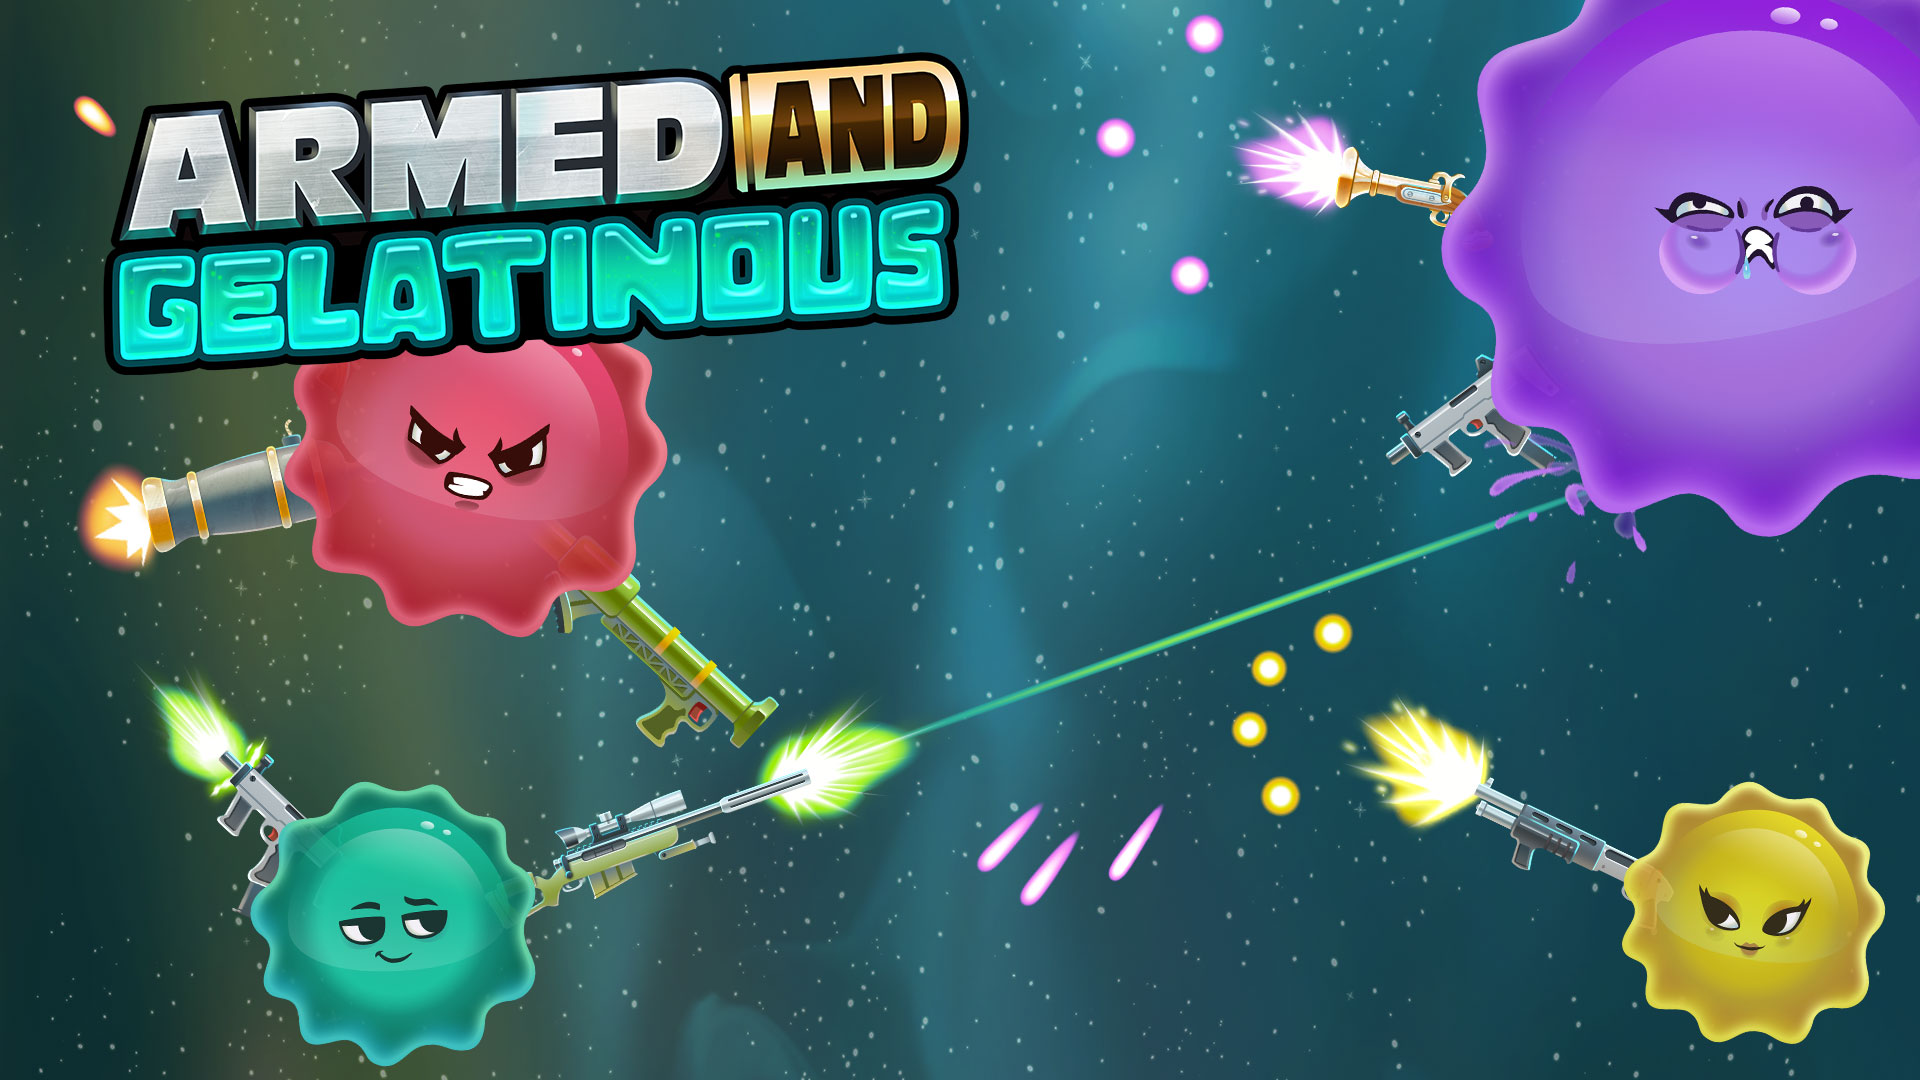 armed-and-gelatinous-gameplay-trailer-thumbnail